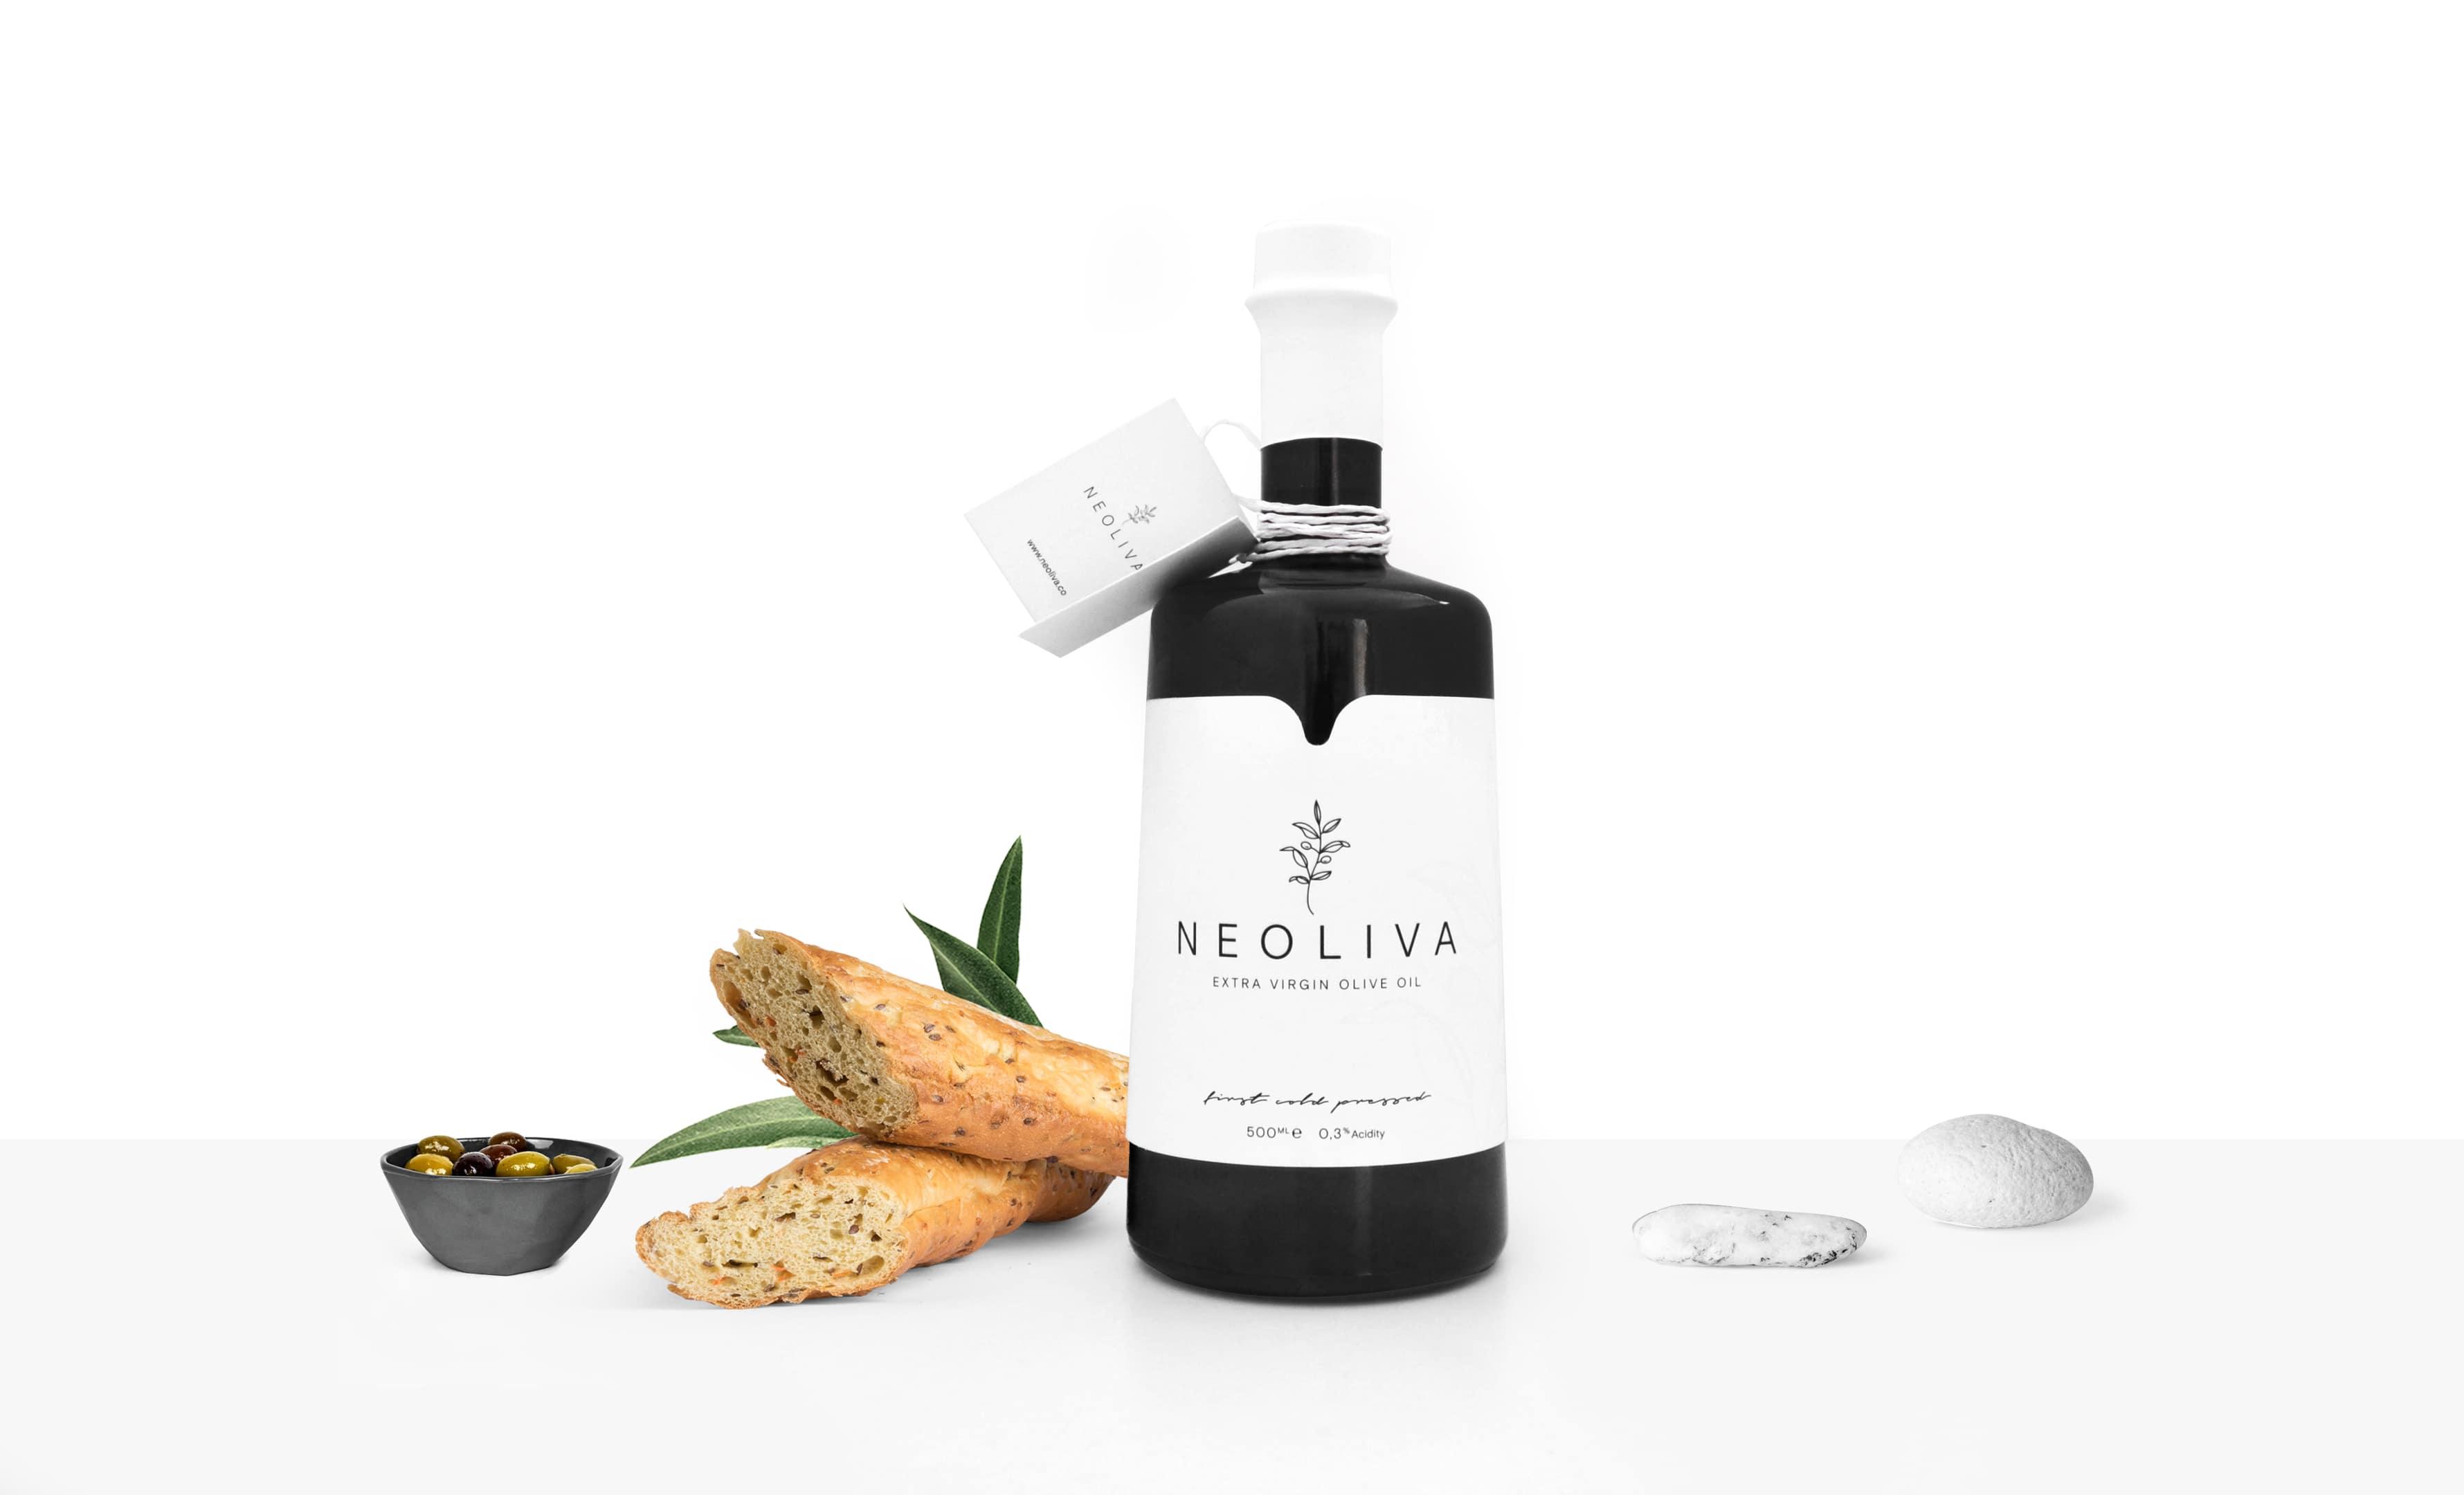 Neoliva-Gokten-Tut-Website-1